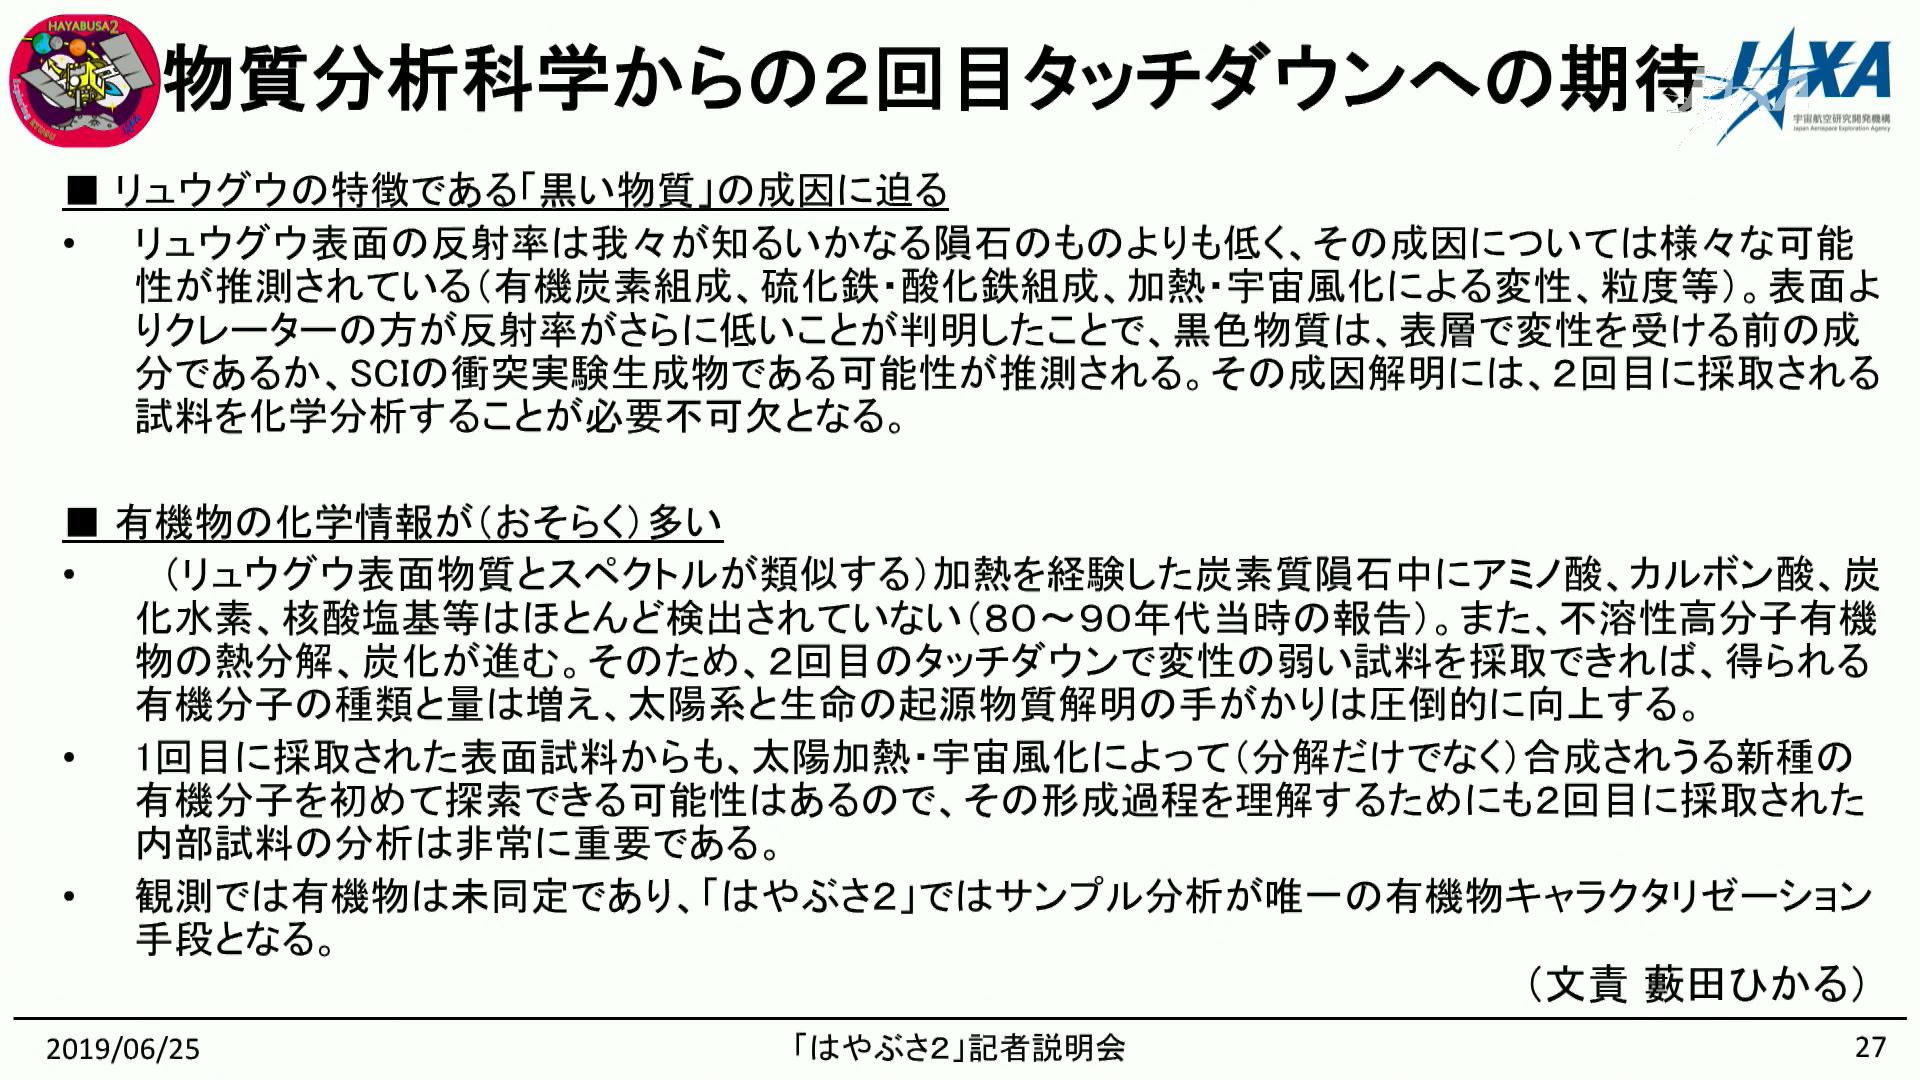 f:id:Imamura:20190625234935p:plain